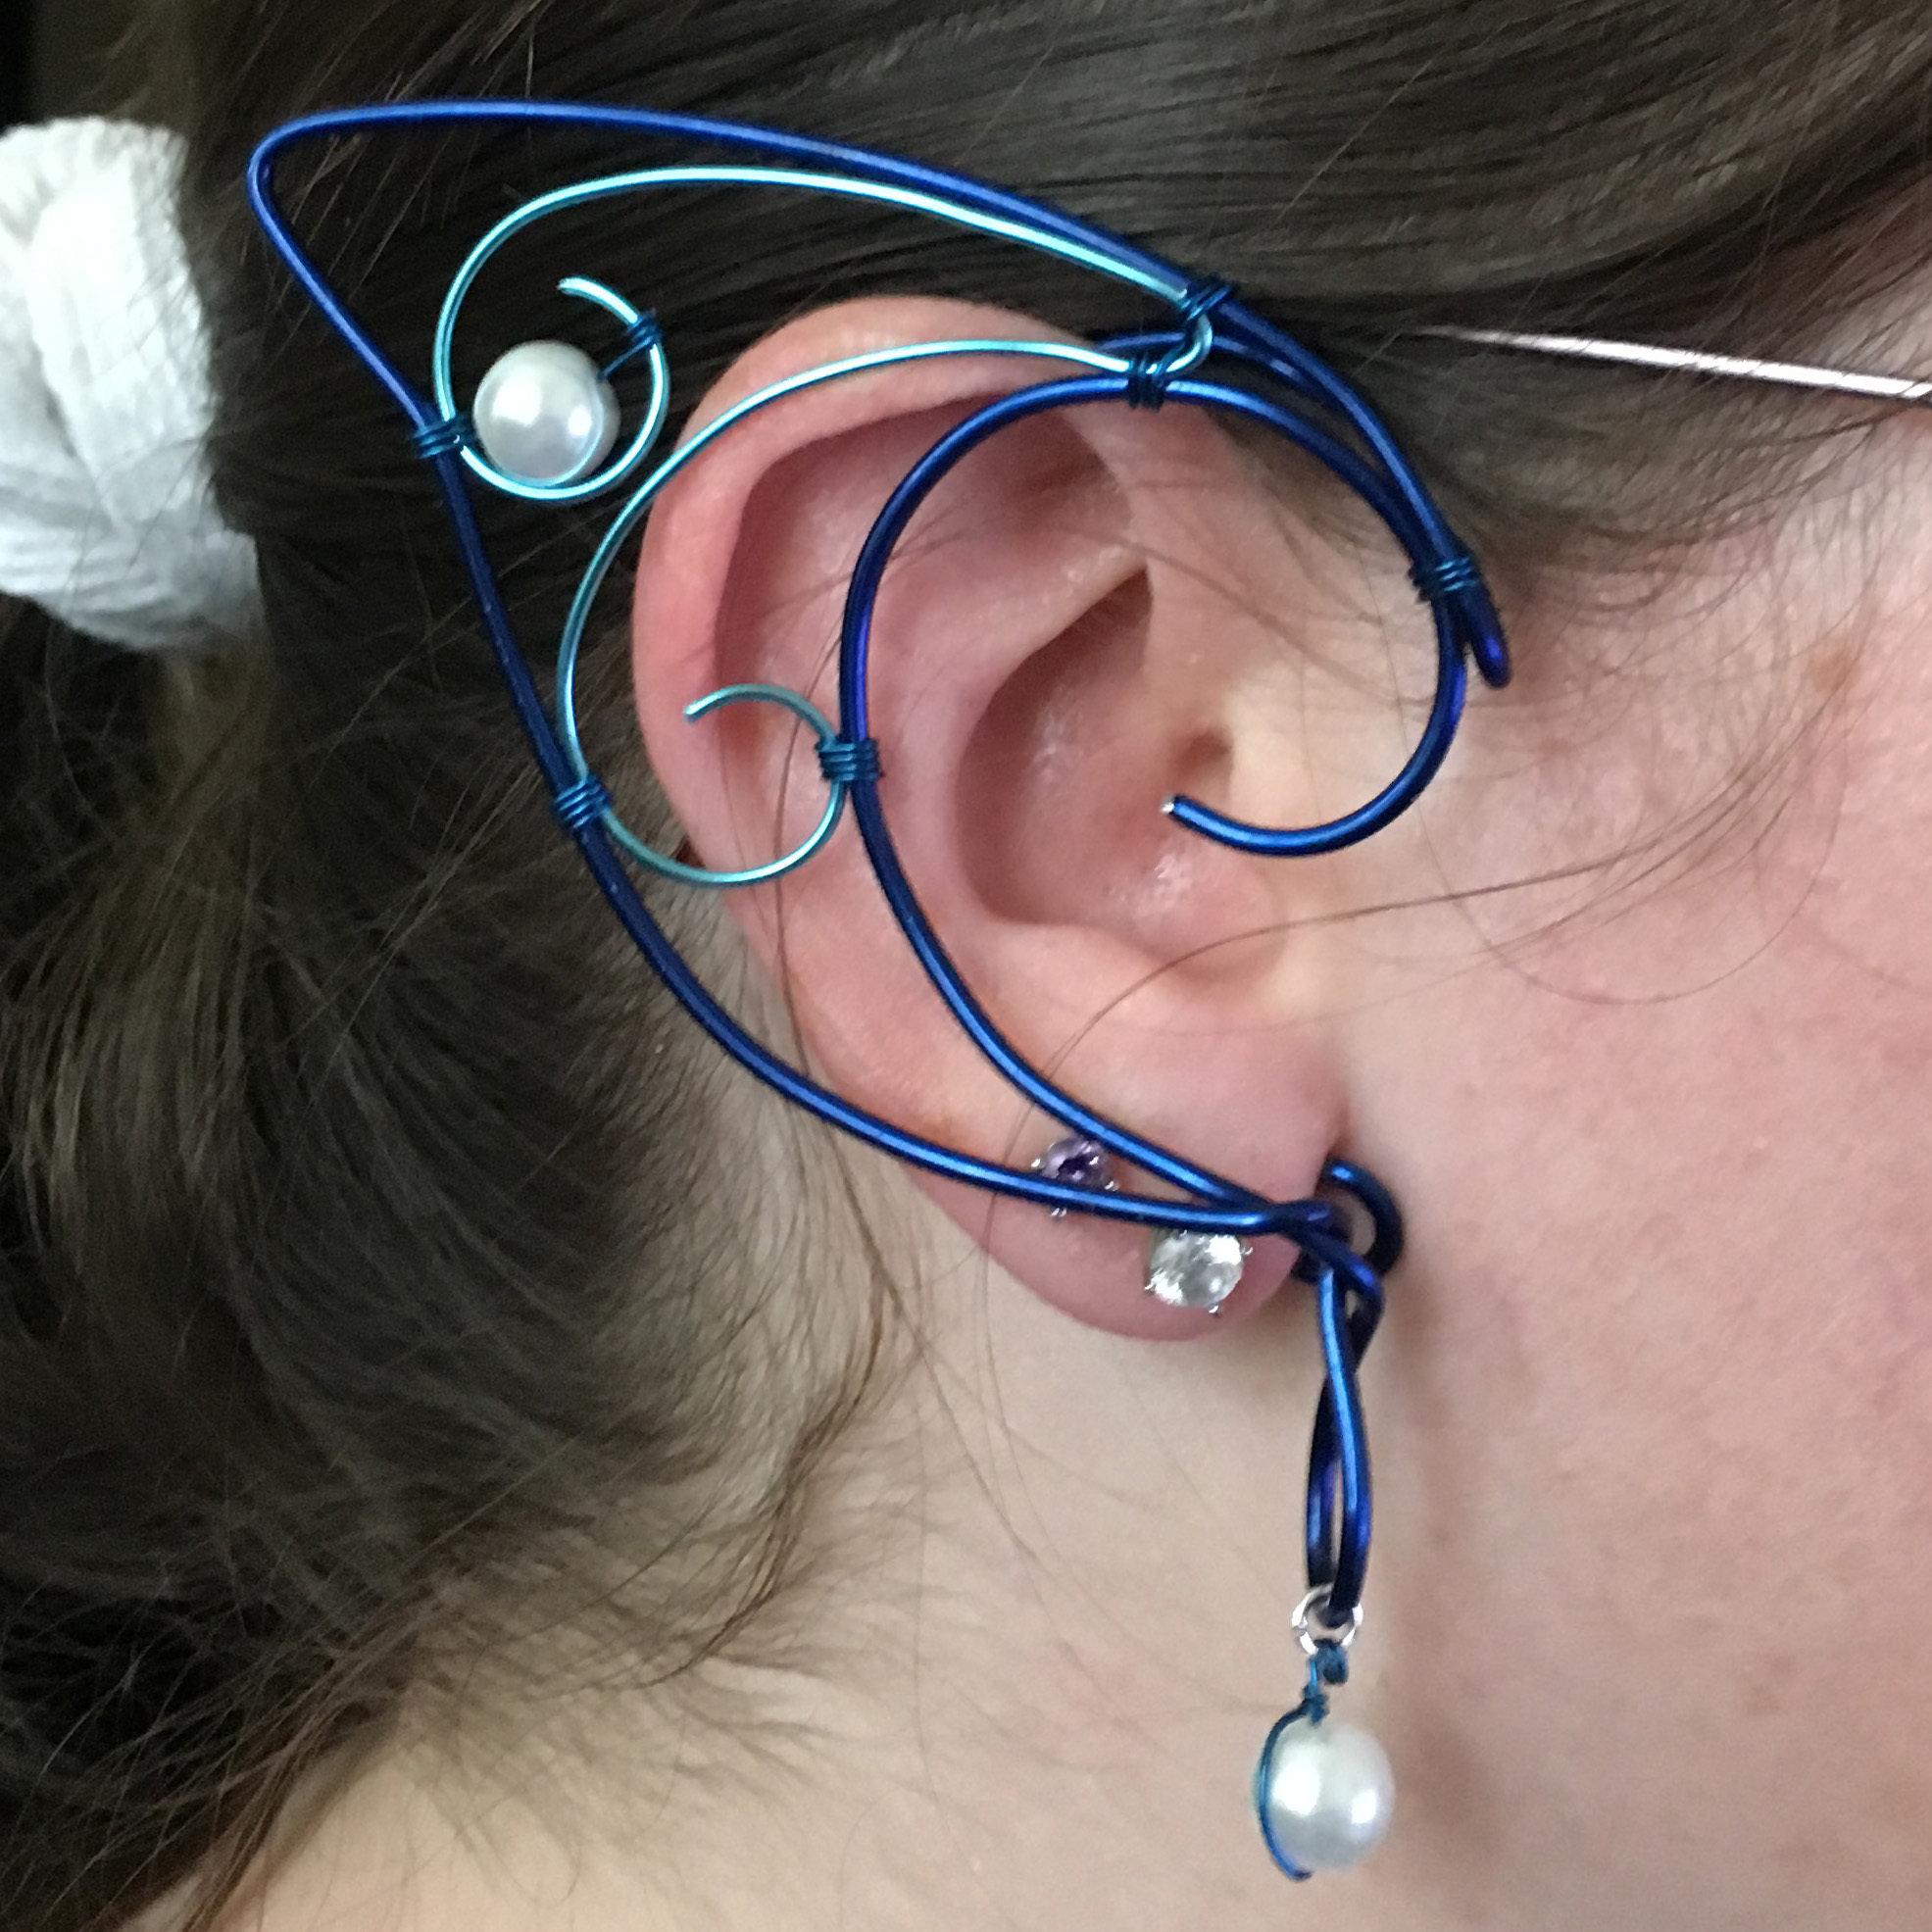 Elf Ear Cuff - Blue and Cyan with beads EC009